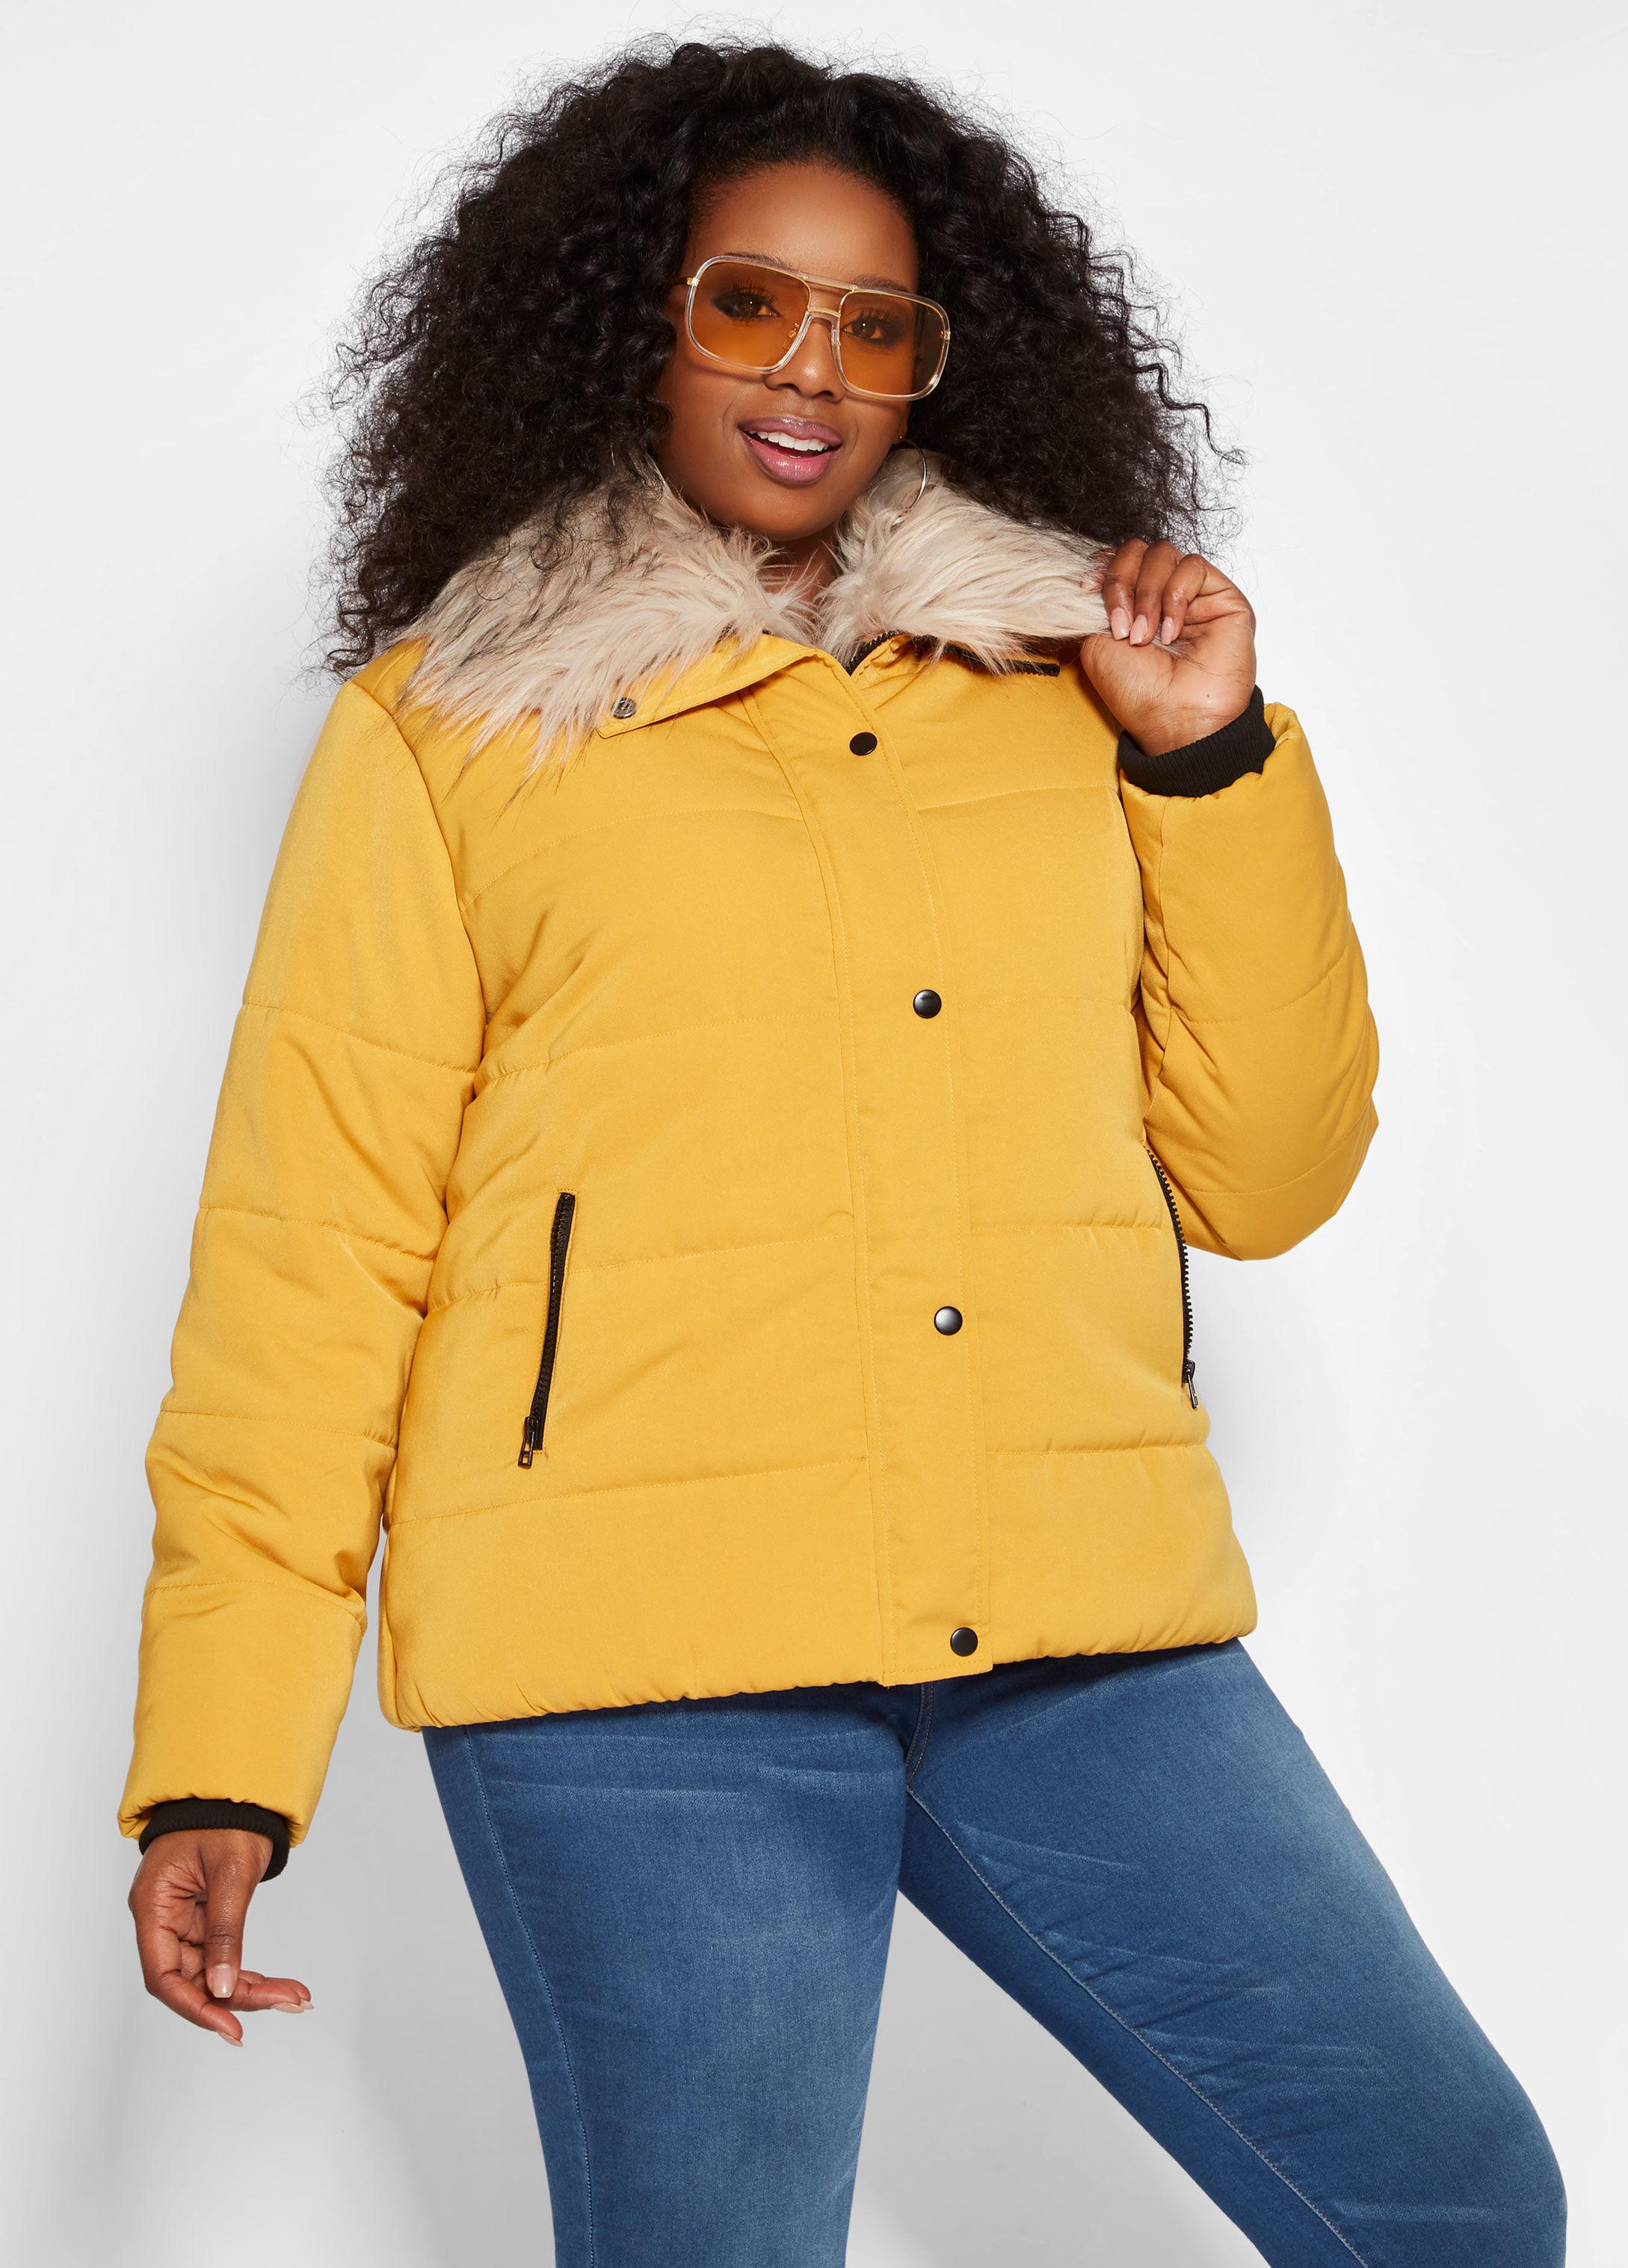 a6c1012b7e2 Lyst - Ashley Stewart Plus Size Faux Fur Puffer Jacket in Yellow